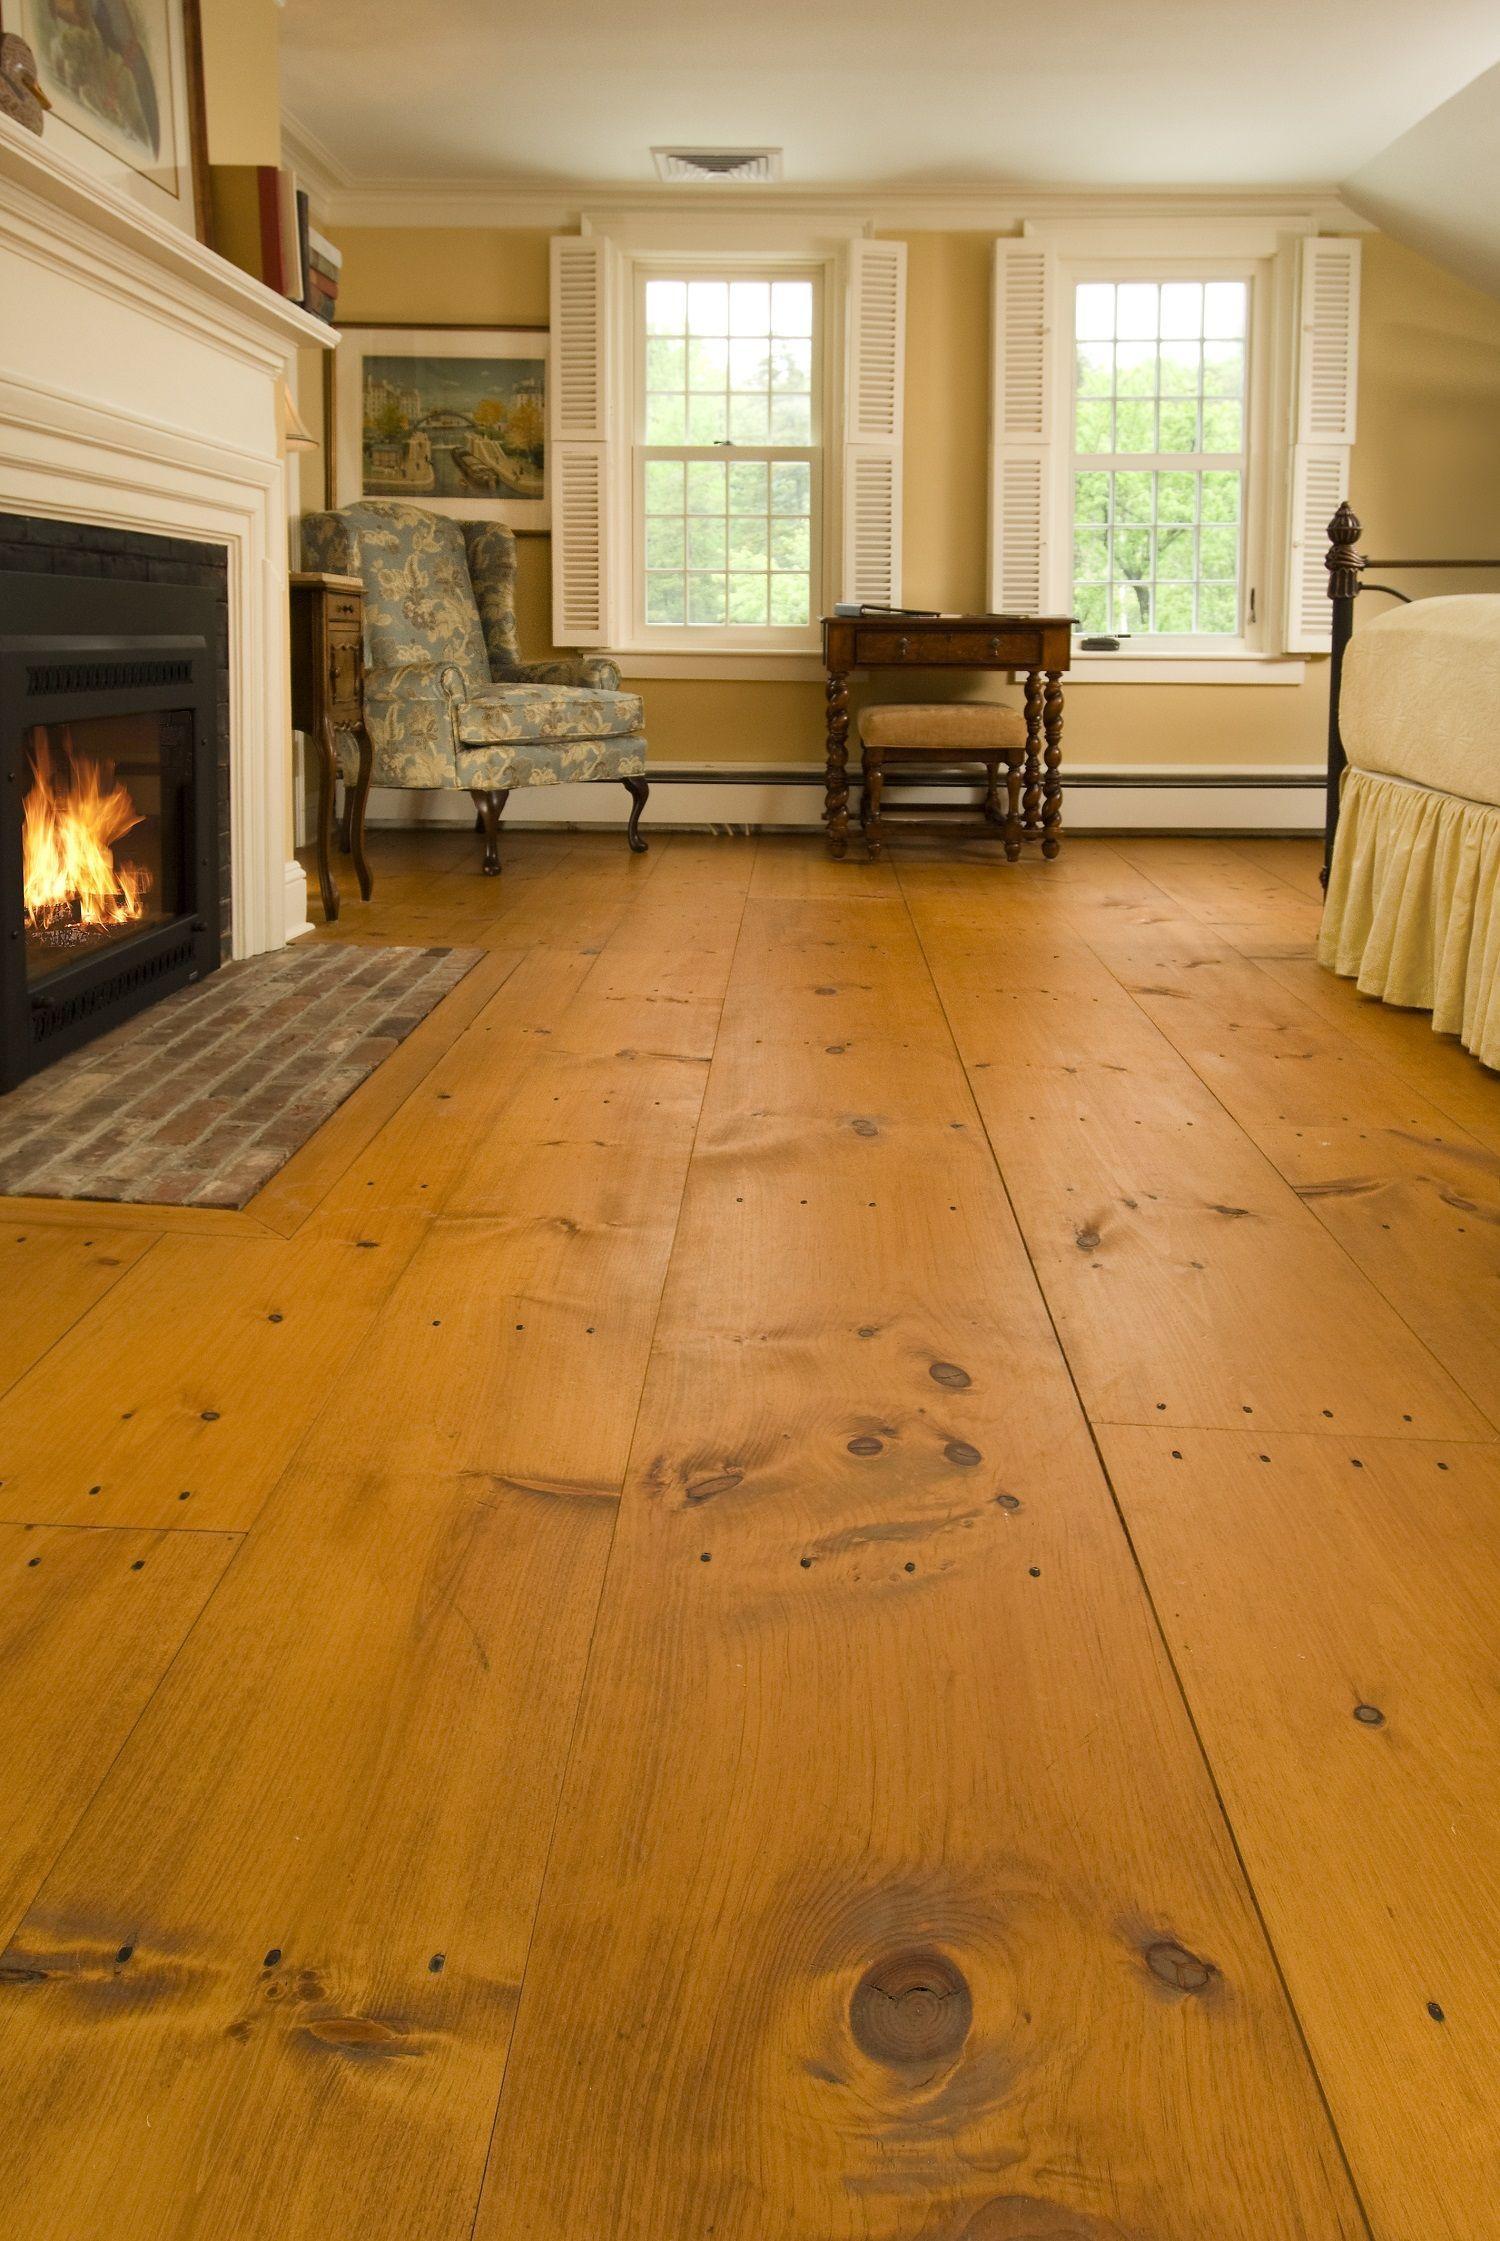 Eastern White Pine Auger Kitchen Farmhouse Flooring Pine Floors Wide Plank Flooring